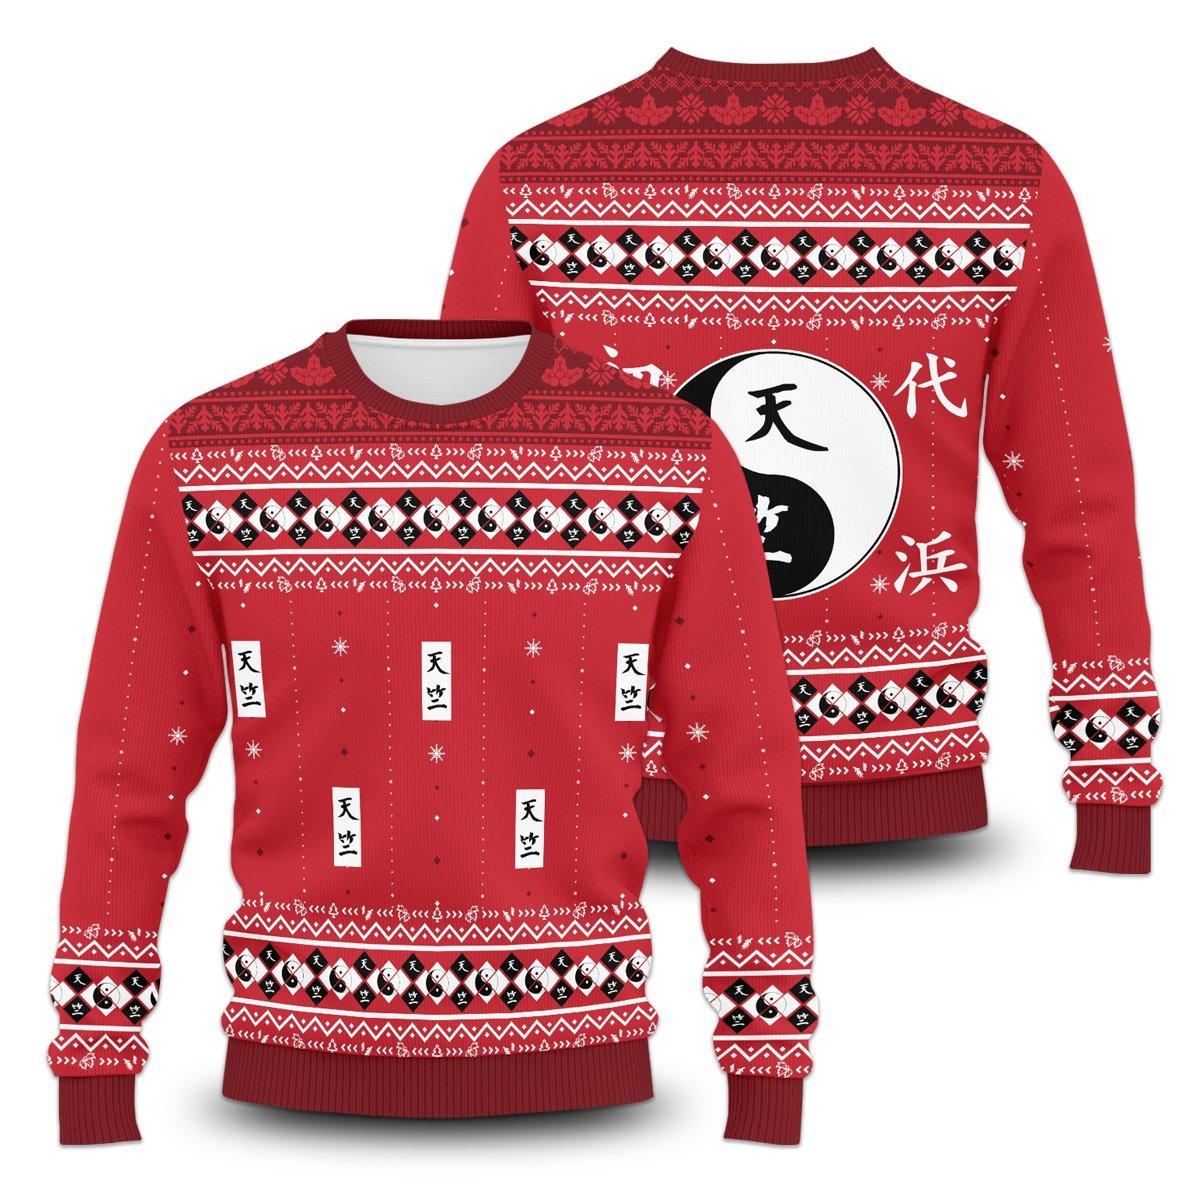 Tenjiku Xmas Unisex Wool Sweater FDM0310 S Official Otaku Treat Merch